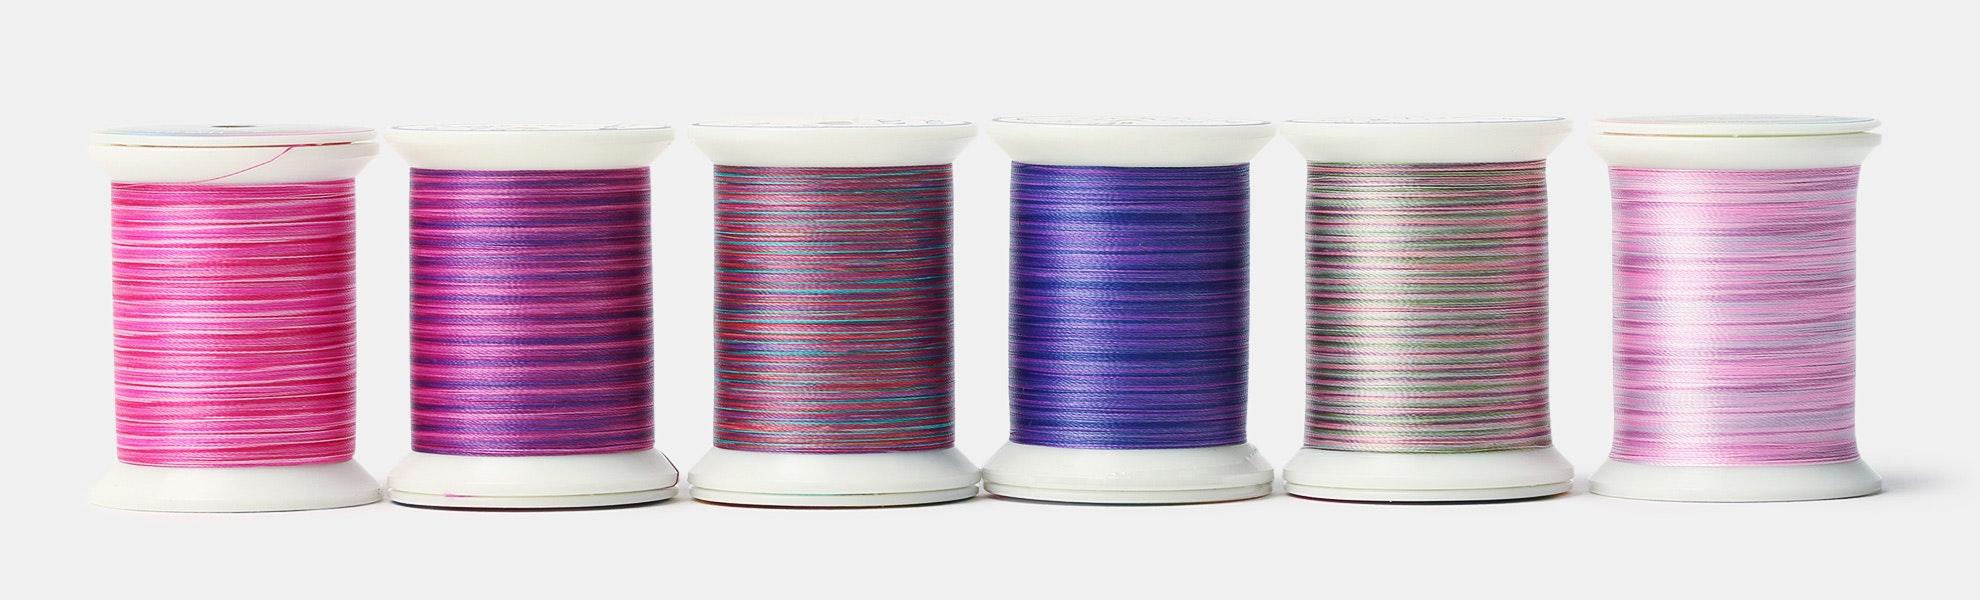 Superior Threads Rainbows Thread Set